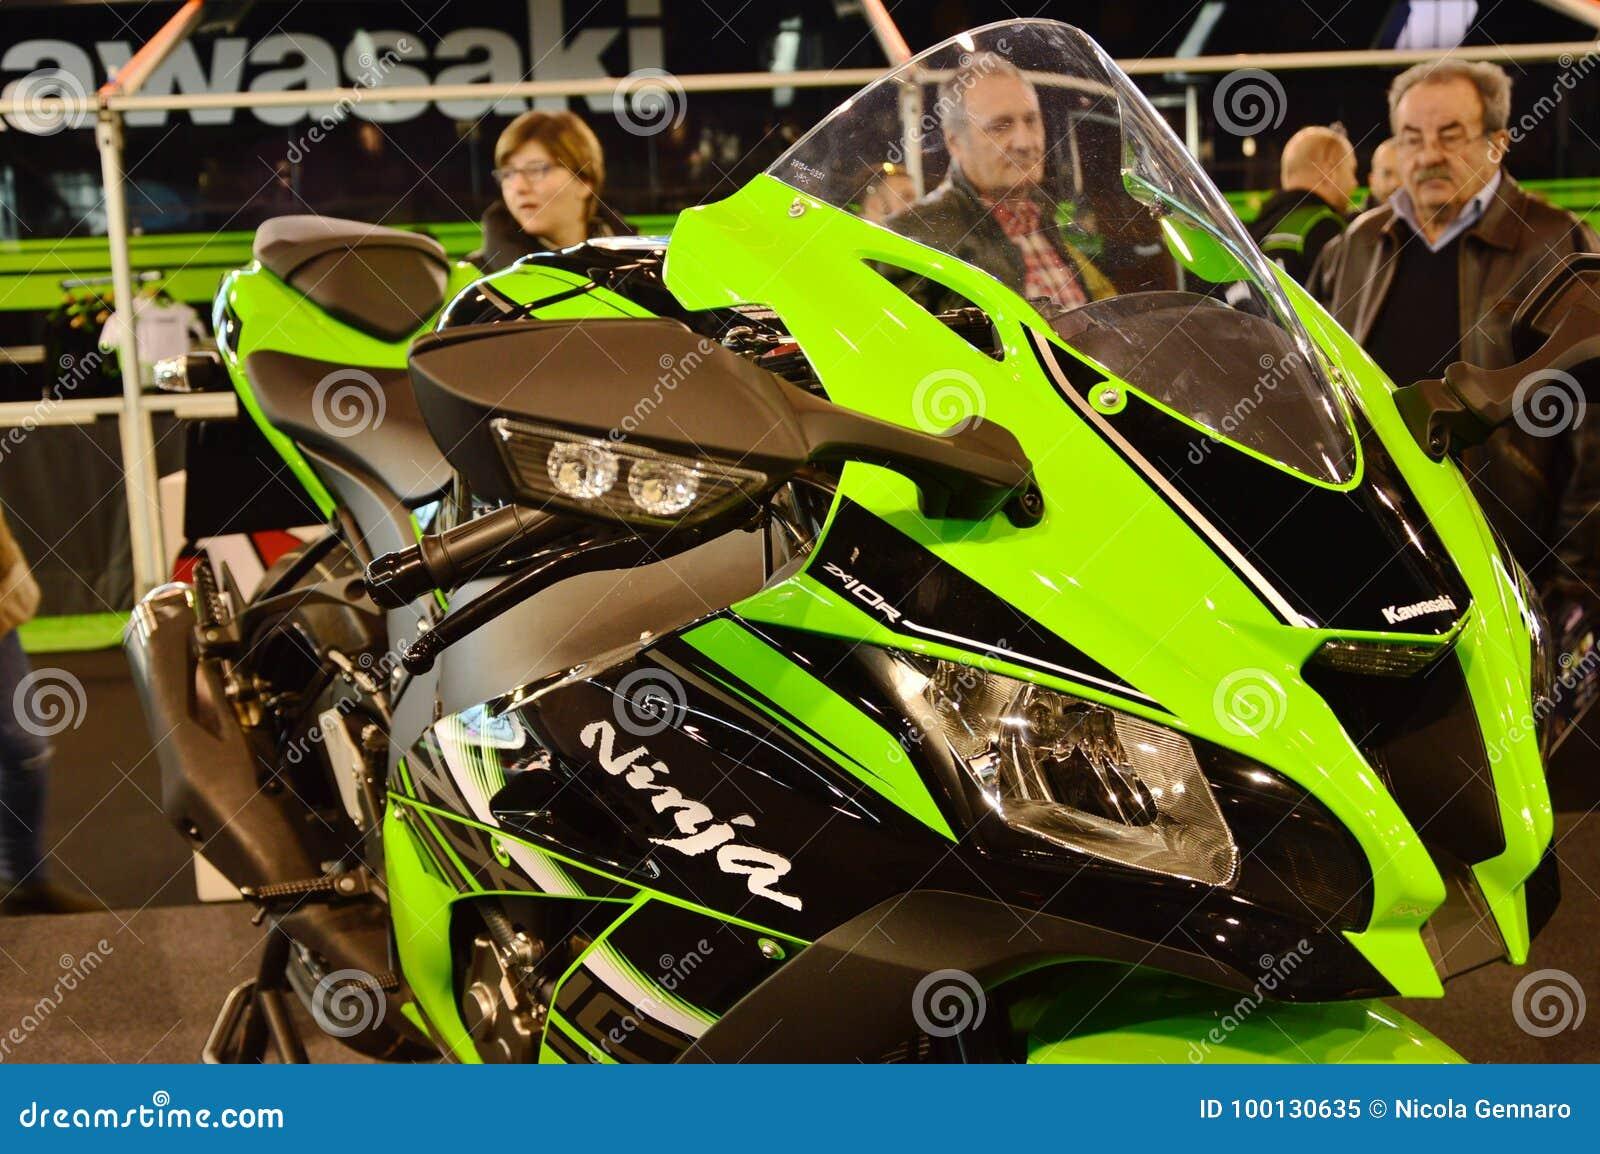 Motor bike expo, motorbike Kavasaki Ninja